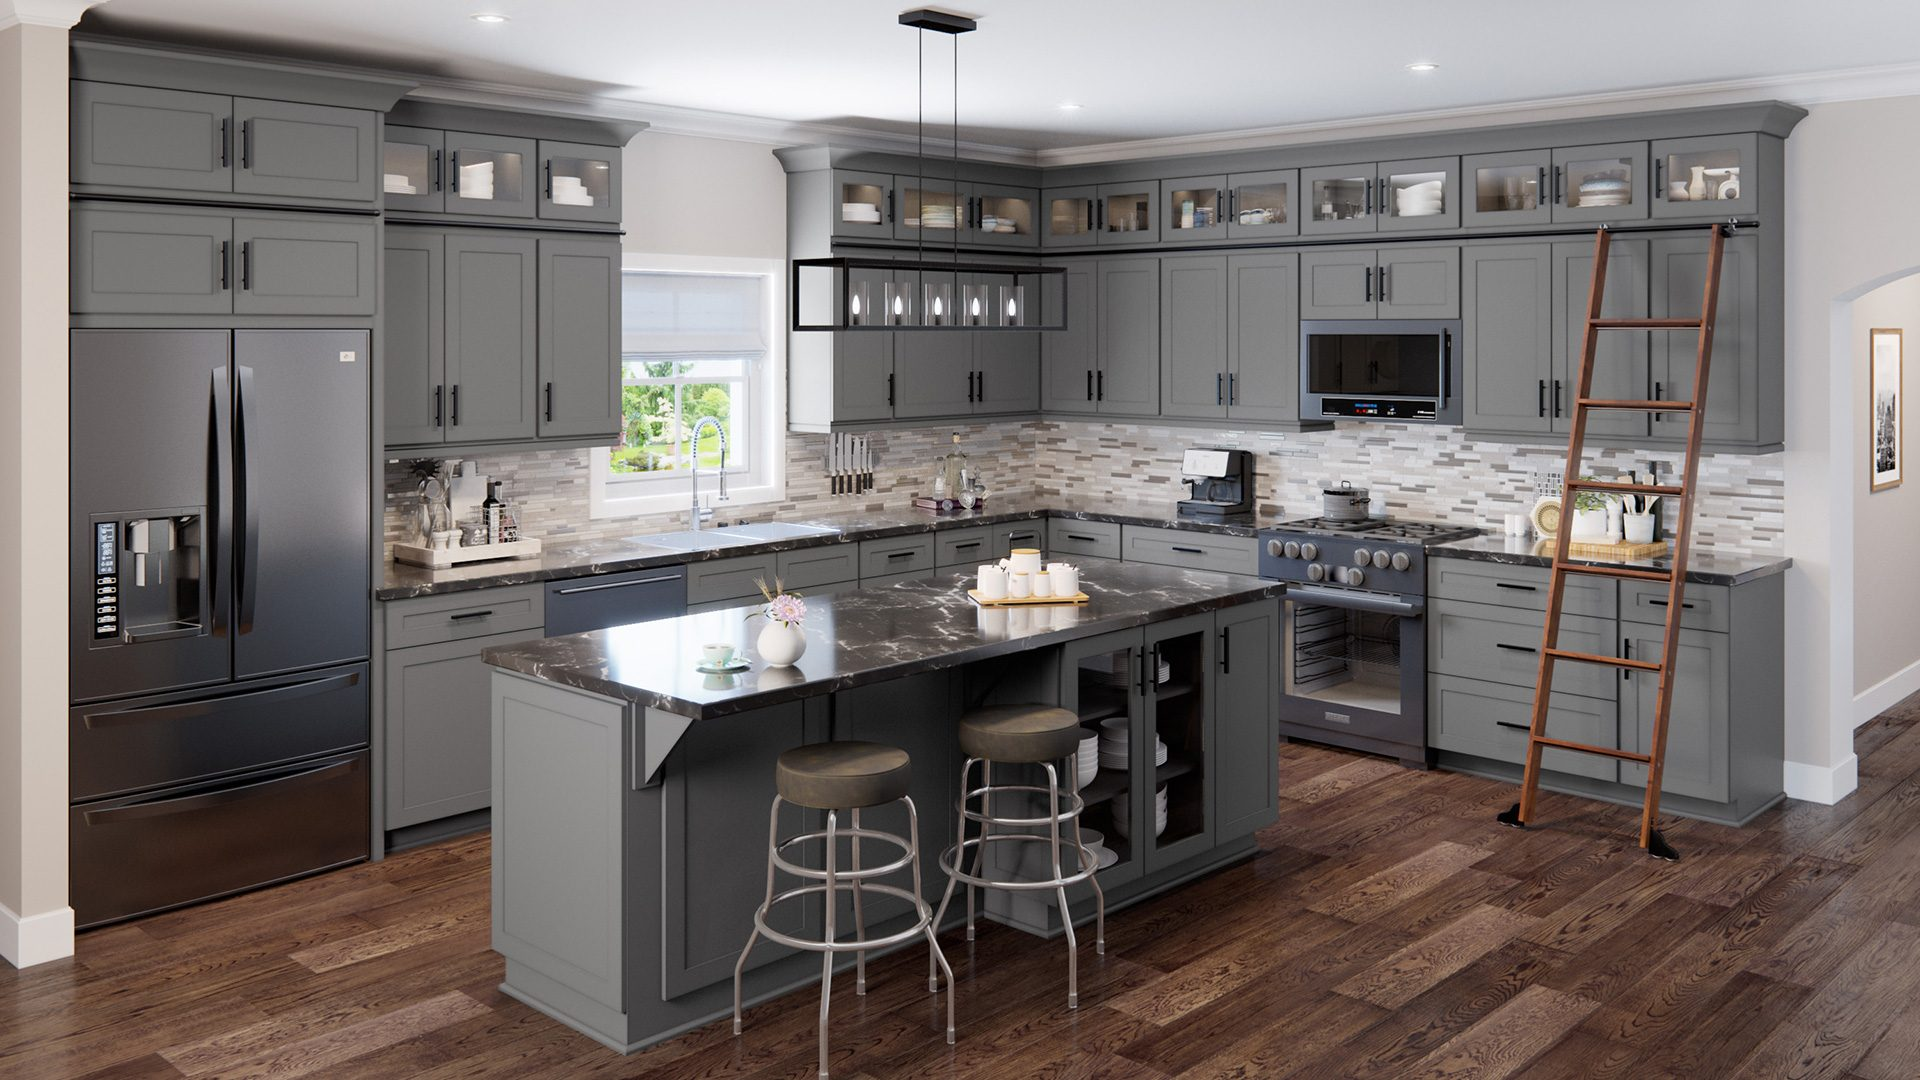 Kitchen Cabinets - CabinetCorp